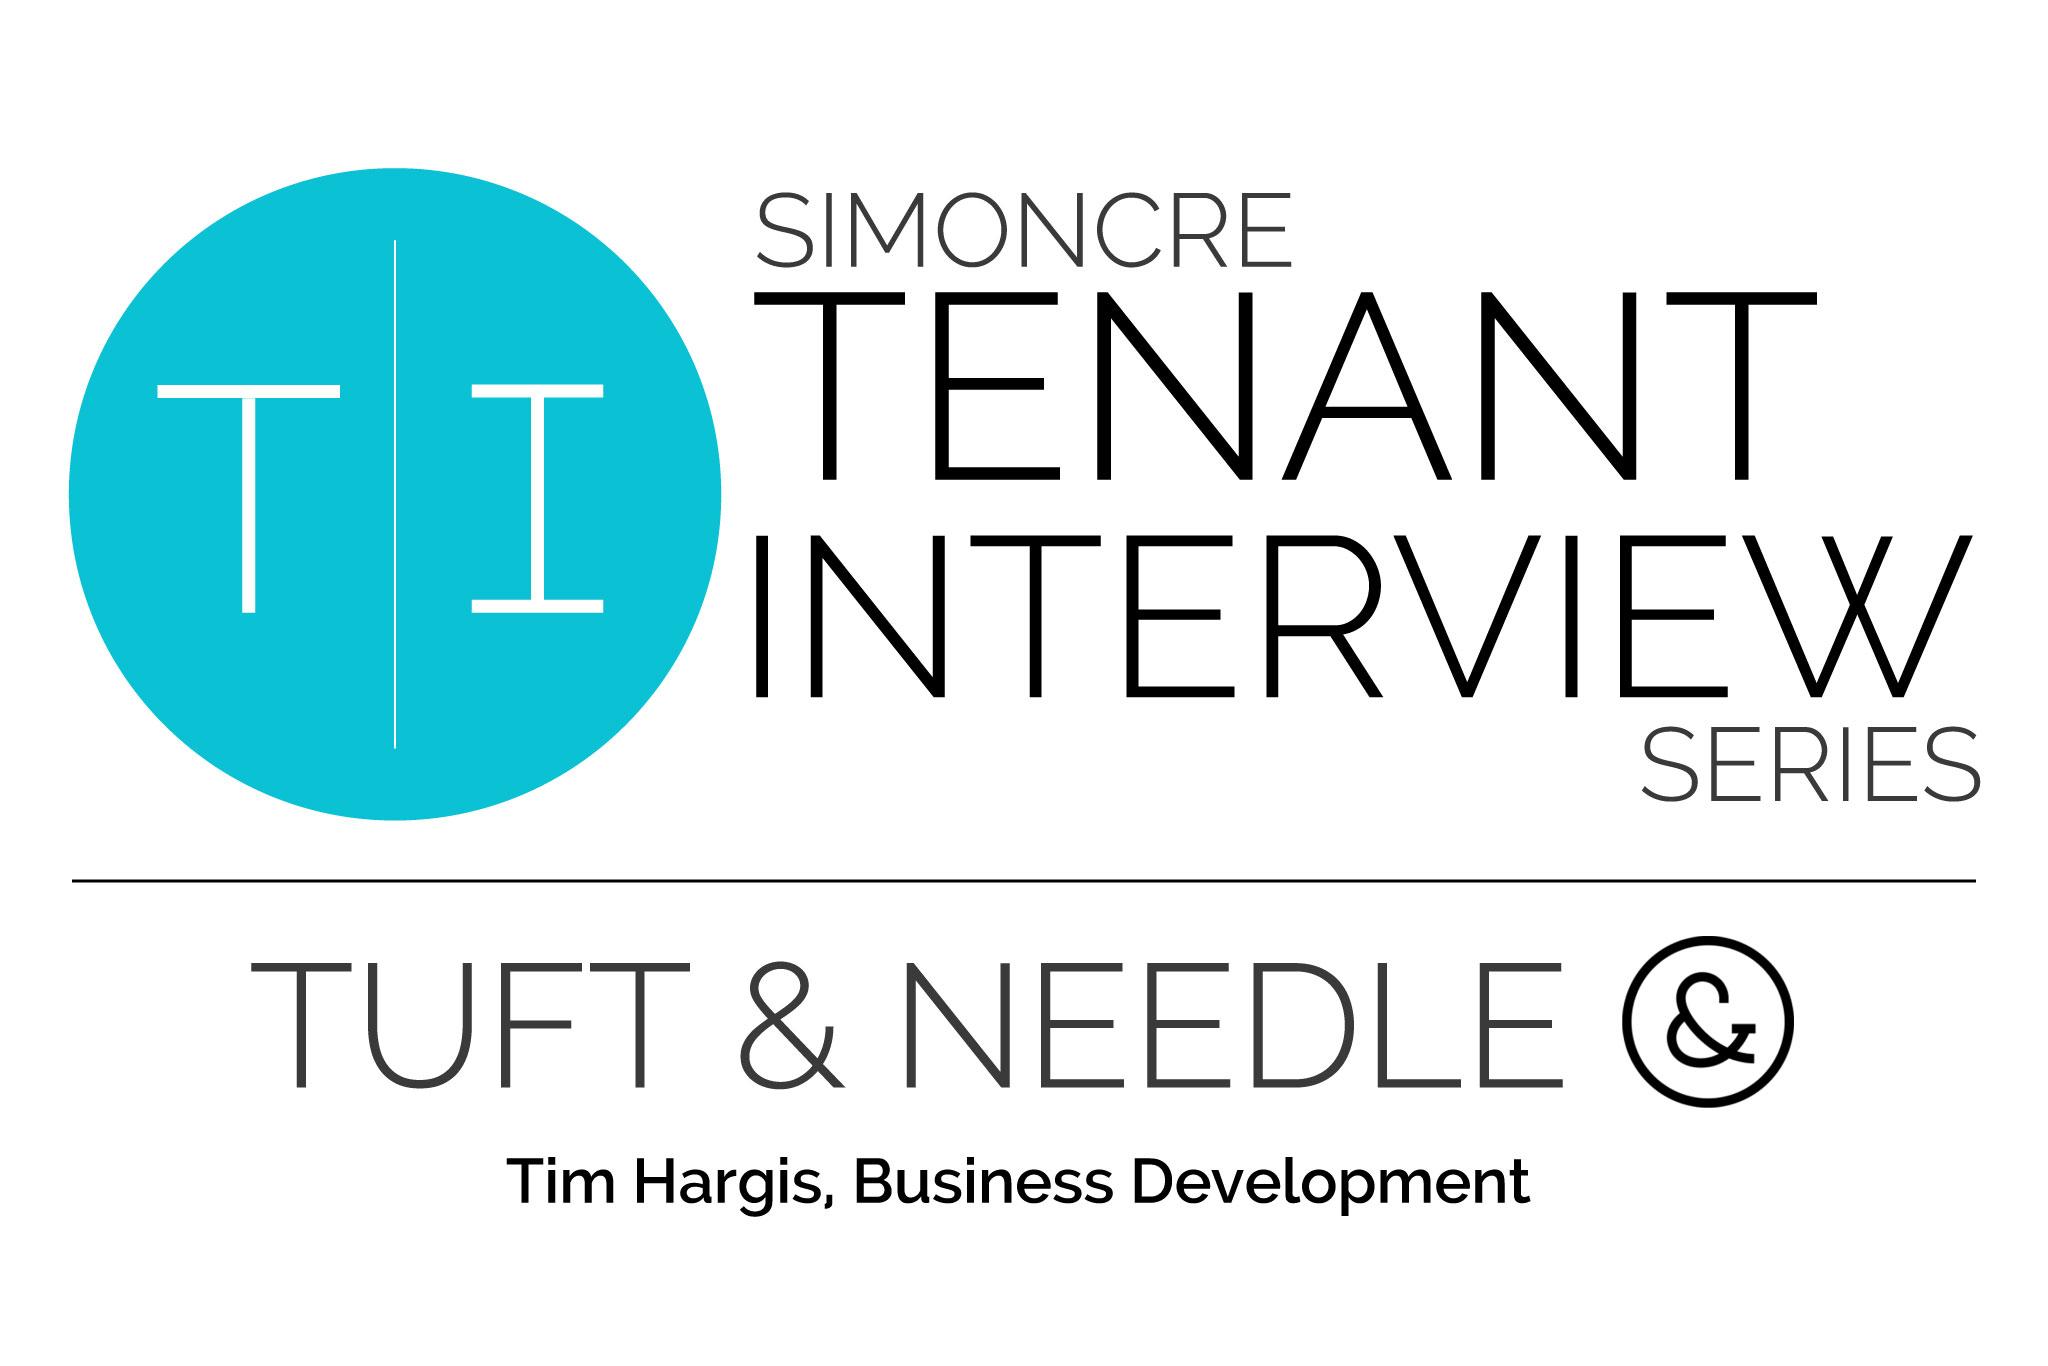 tuft and needle logo. tuft and needle logo